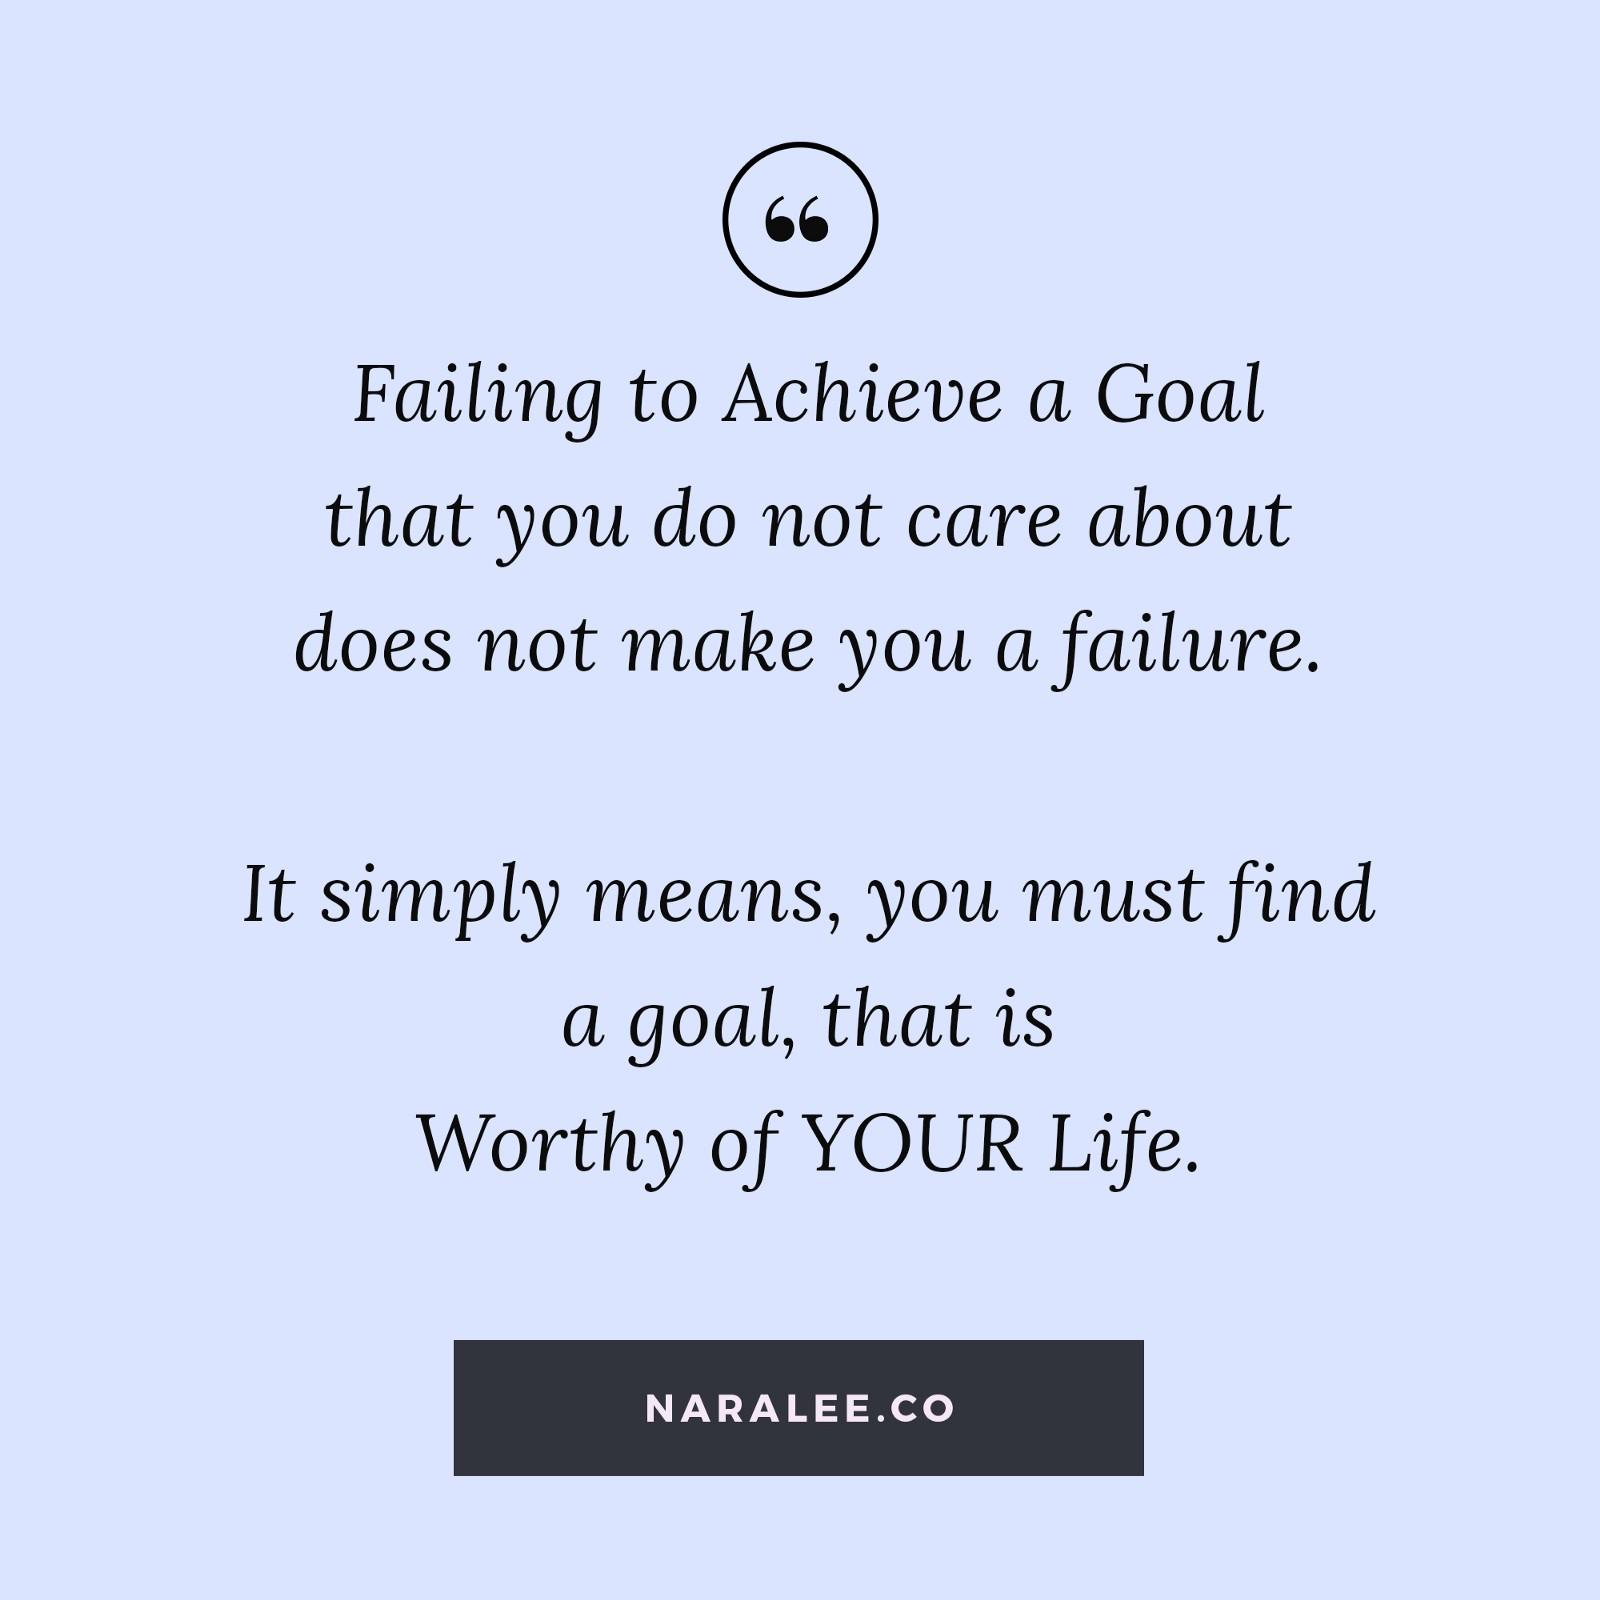 goals_quote_nara_lee.jpeg